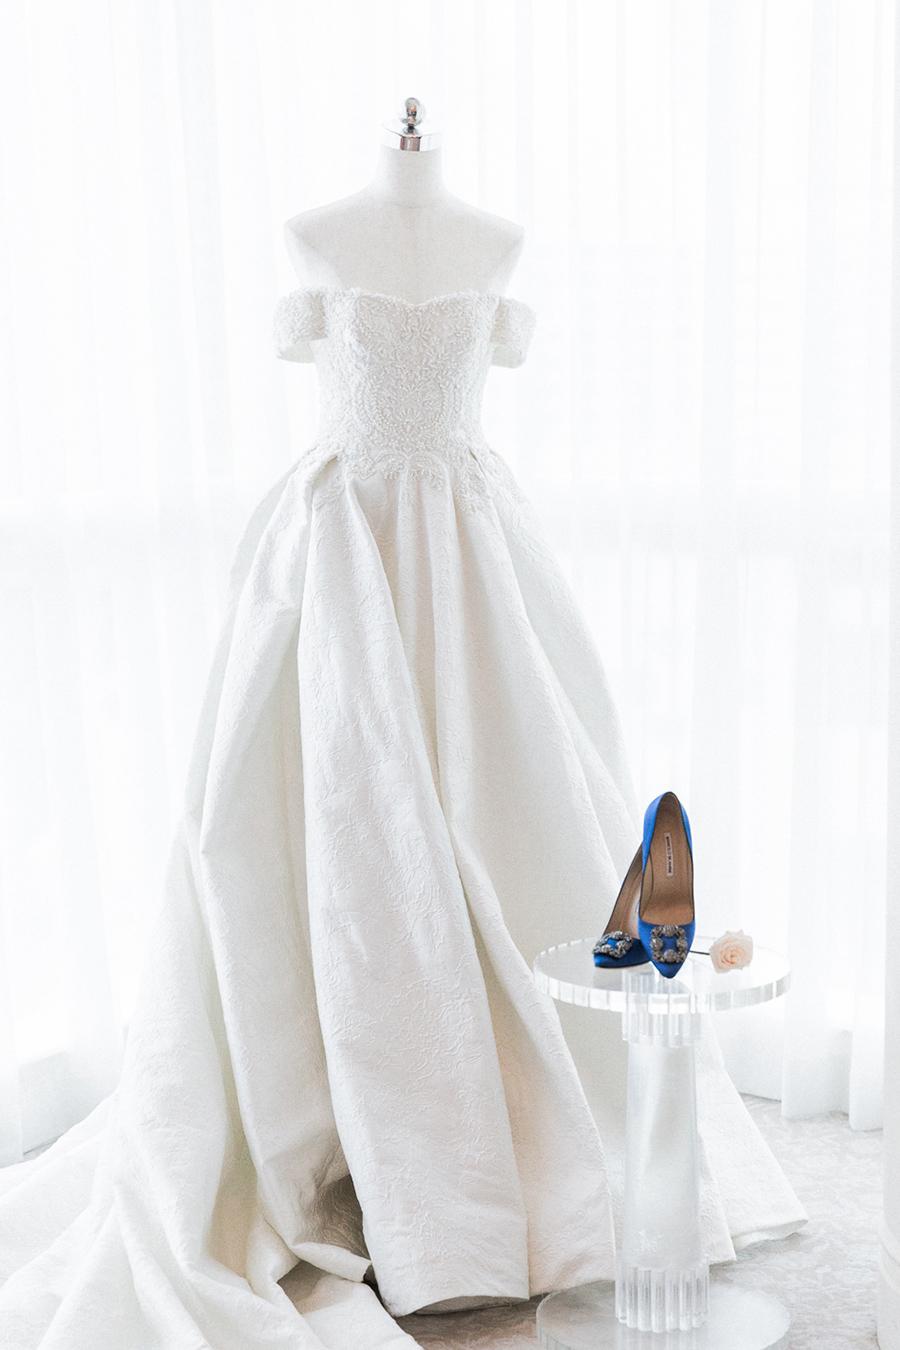 Chen_Sands_Photo_Destination_Wedding_Photographer_StRegis_Singapore-5.jpg